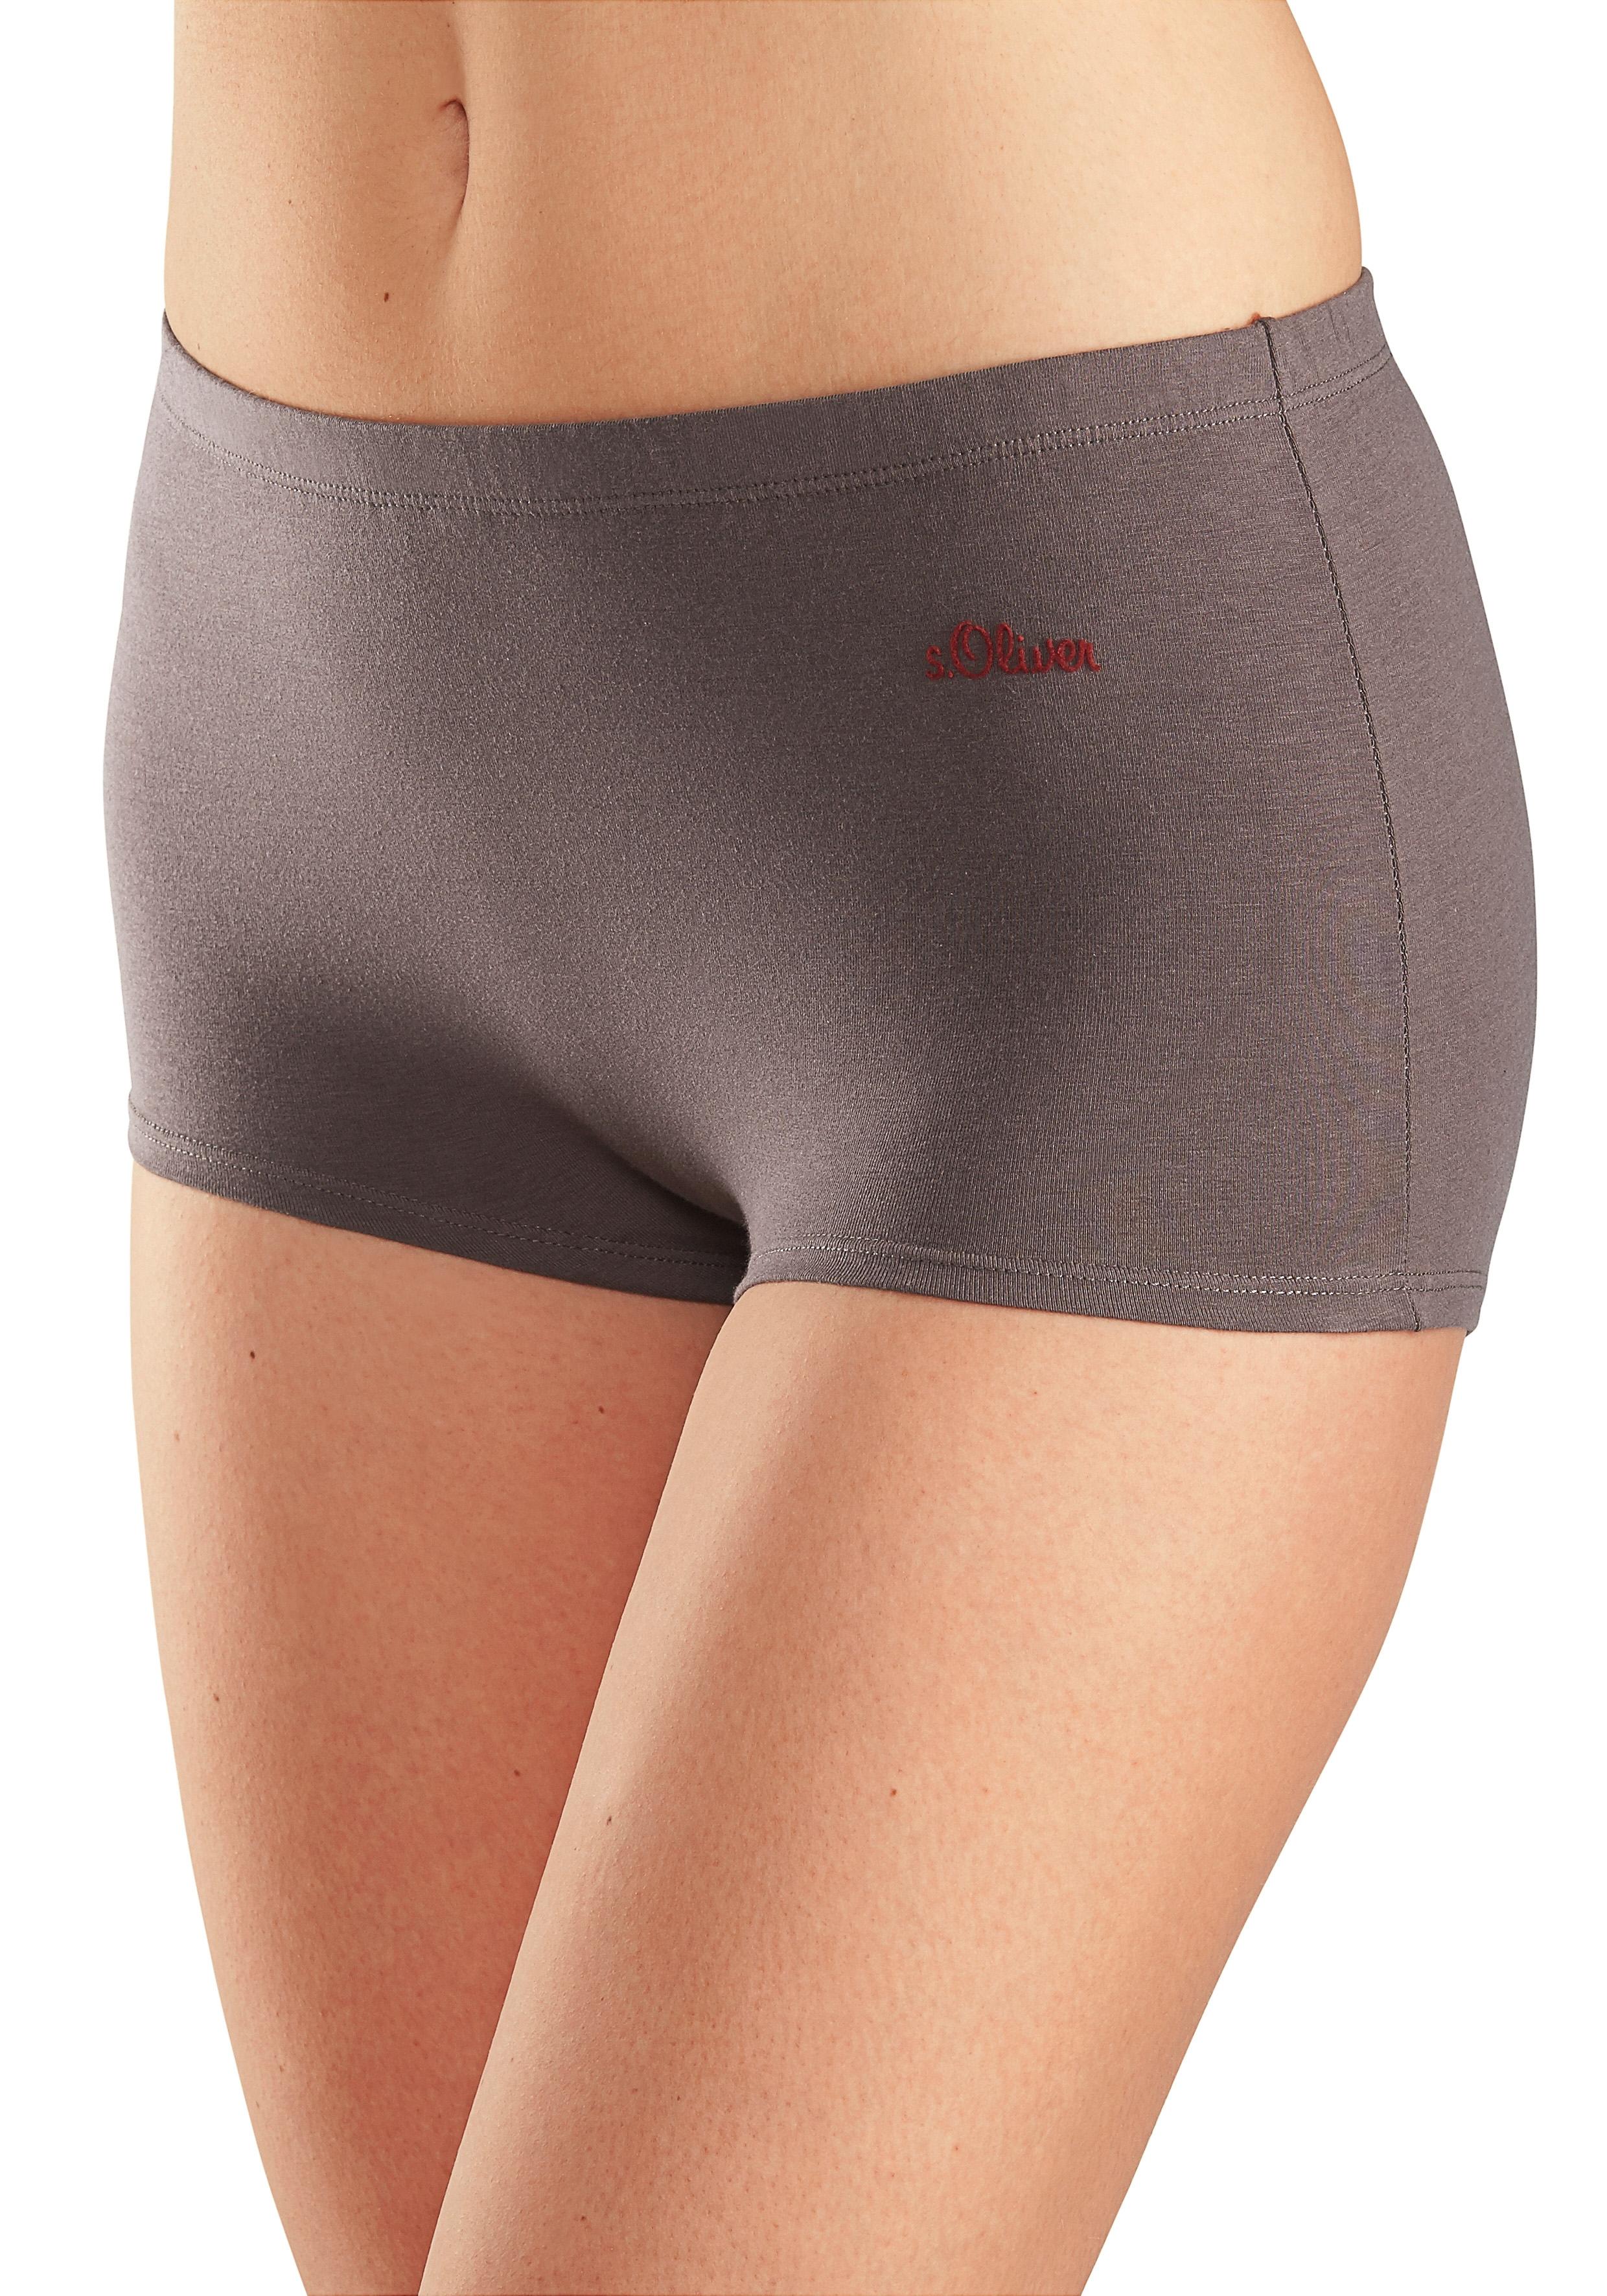 s.Oliver RED LABEL Pants, set van 3, S.OLIVER voordelig en veilig online kopen